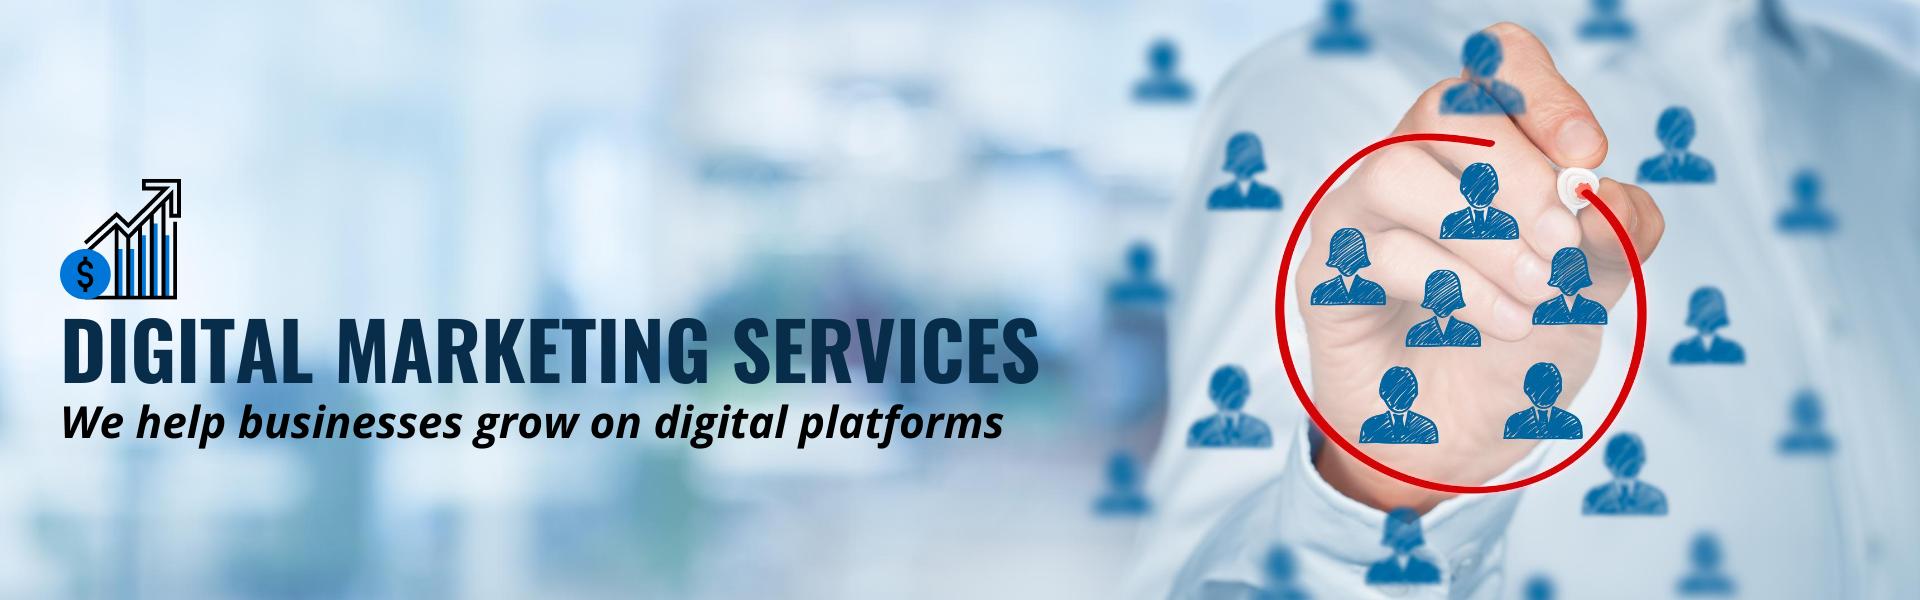 Digital Marketing Services in Boston